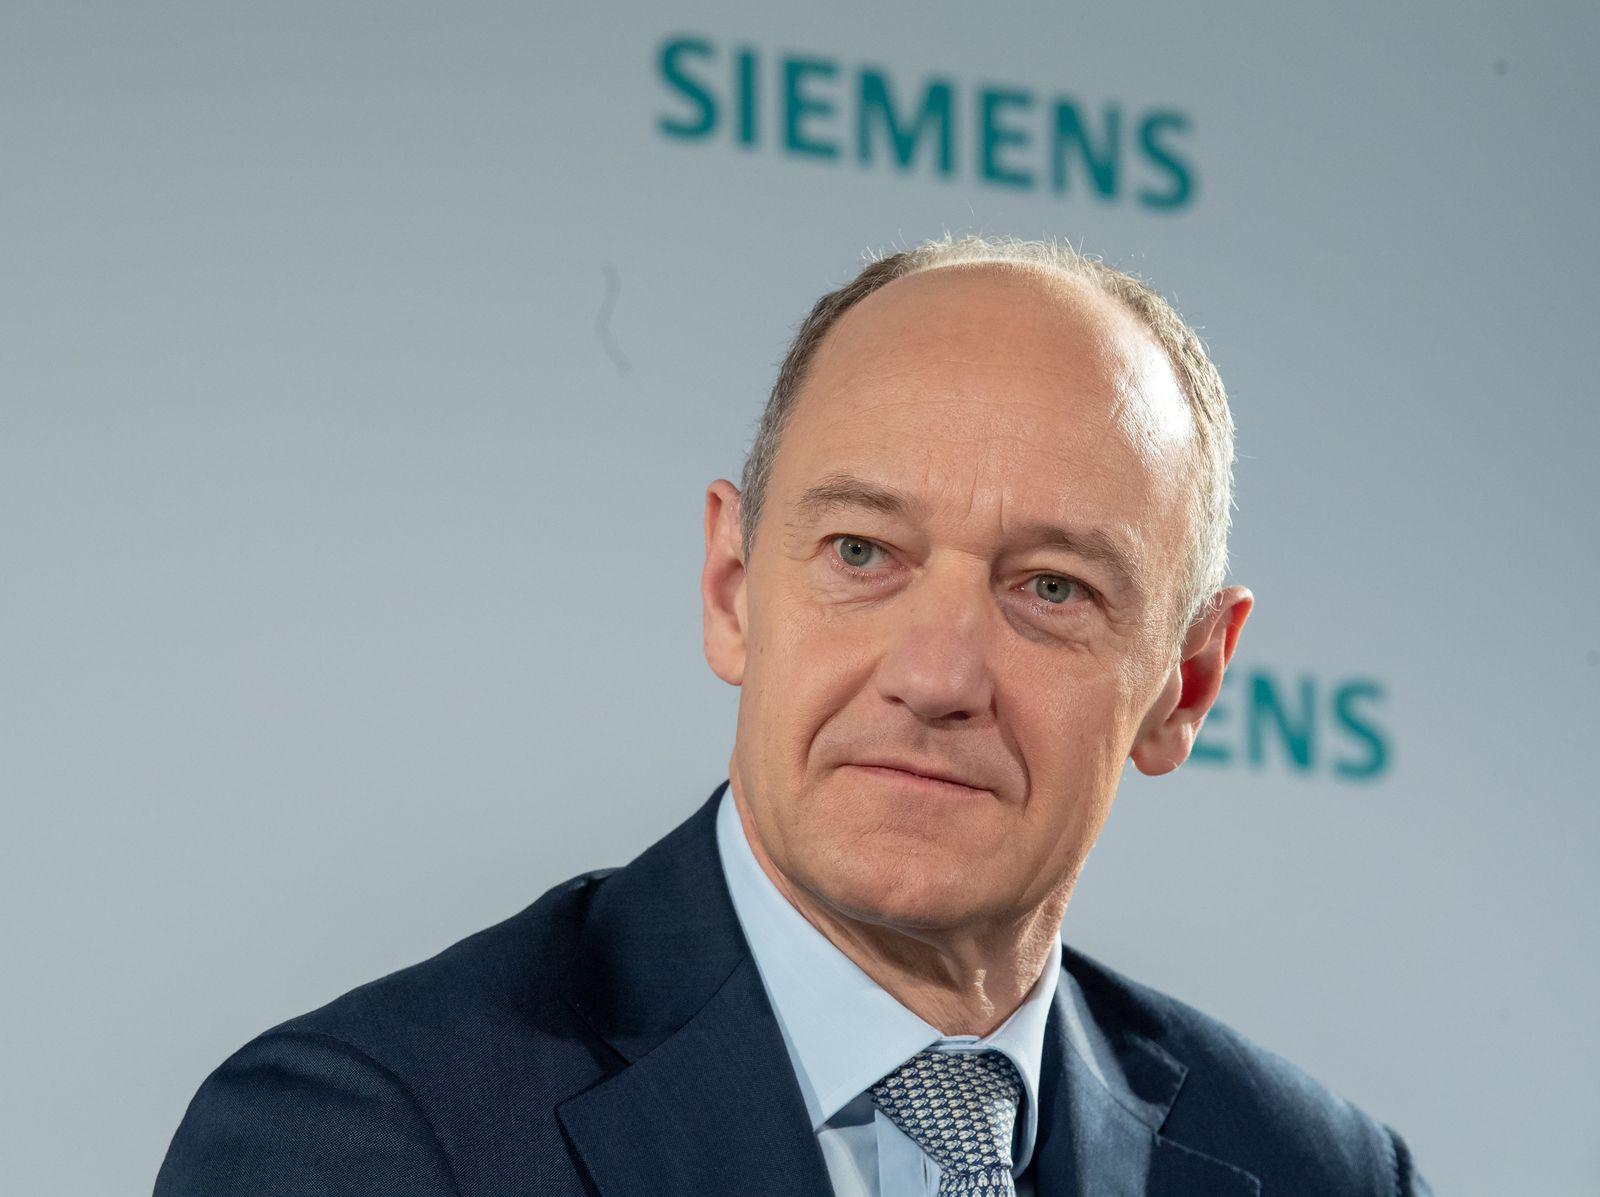 Siemens-Chefsessel